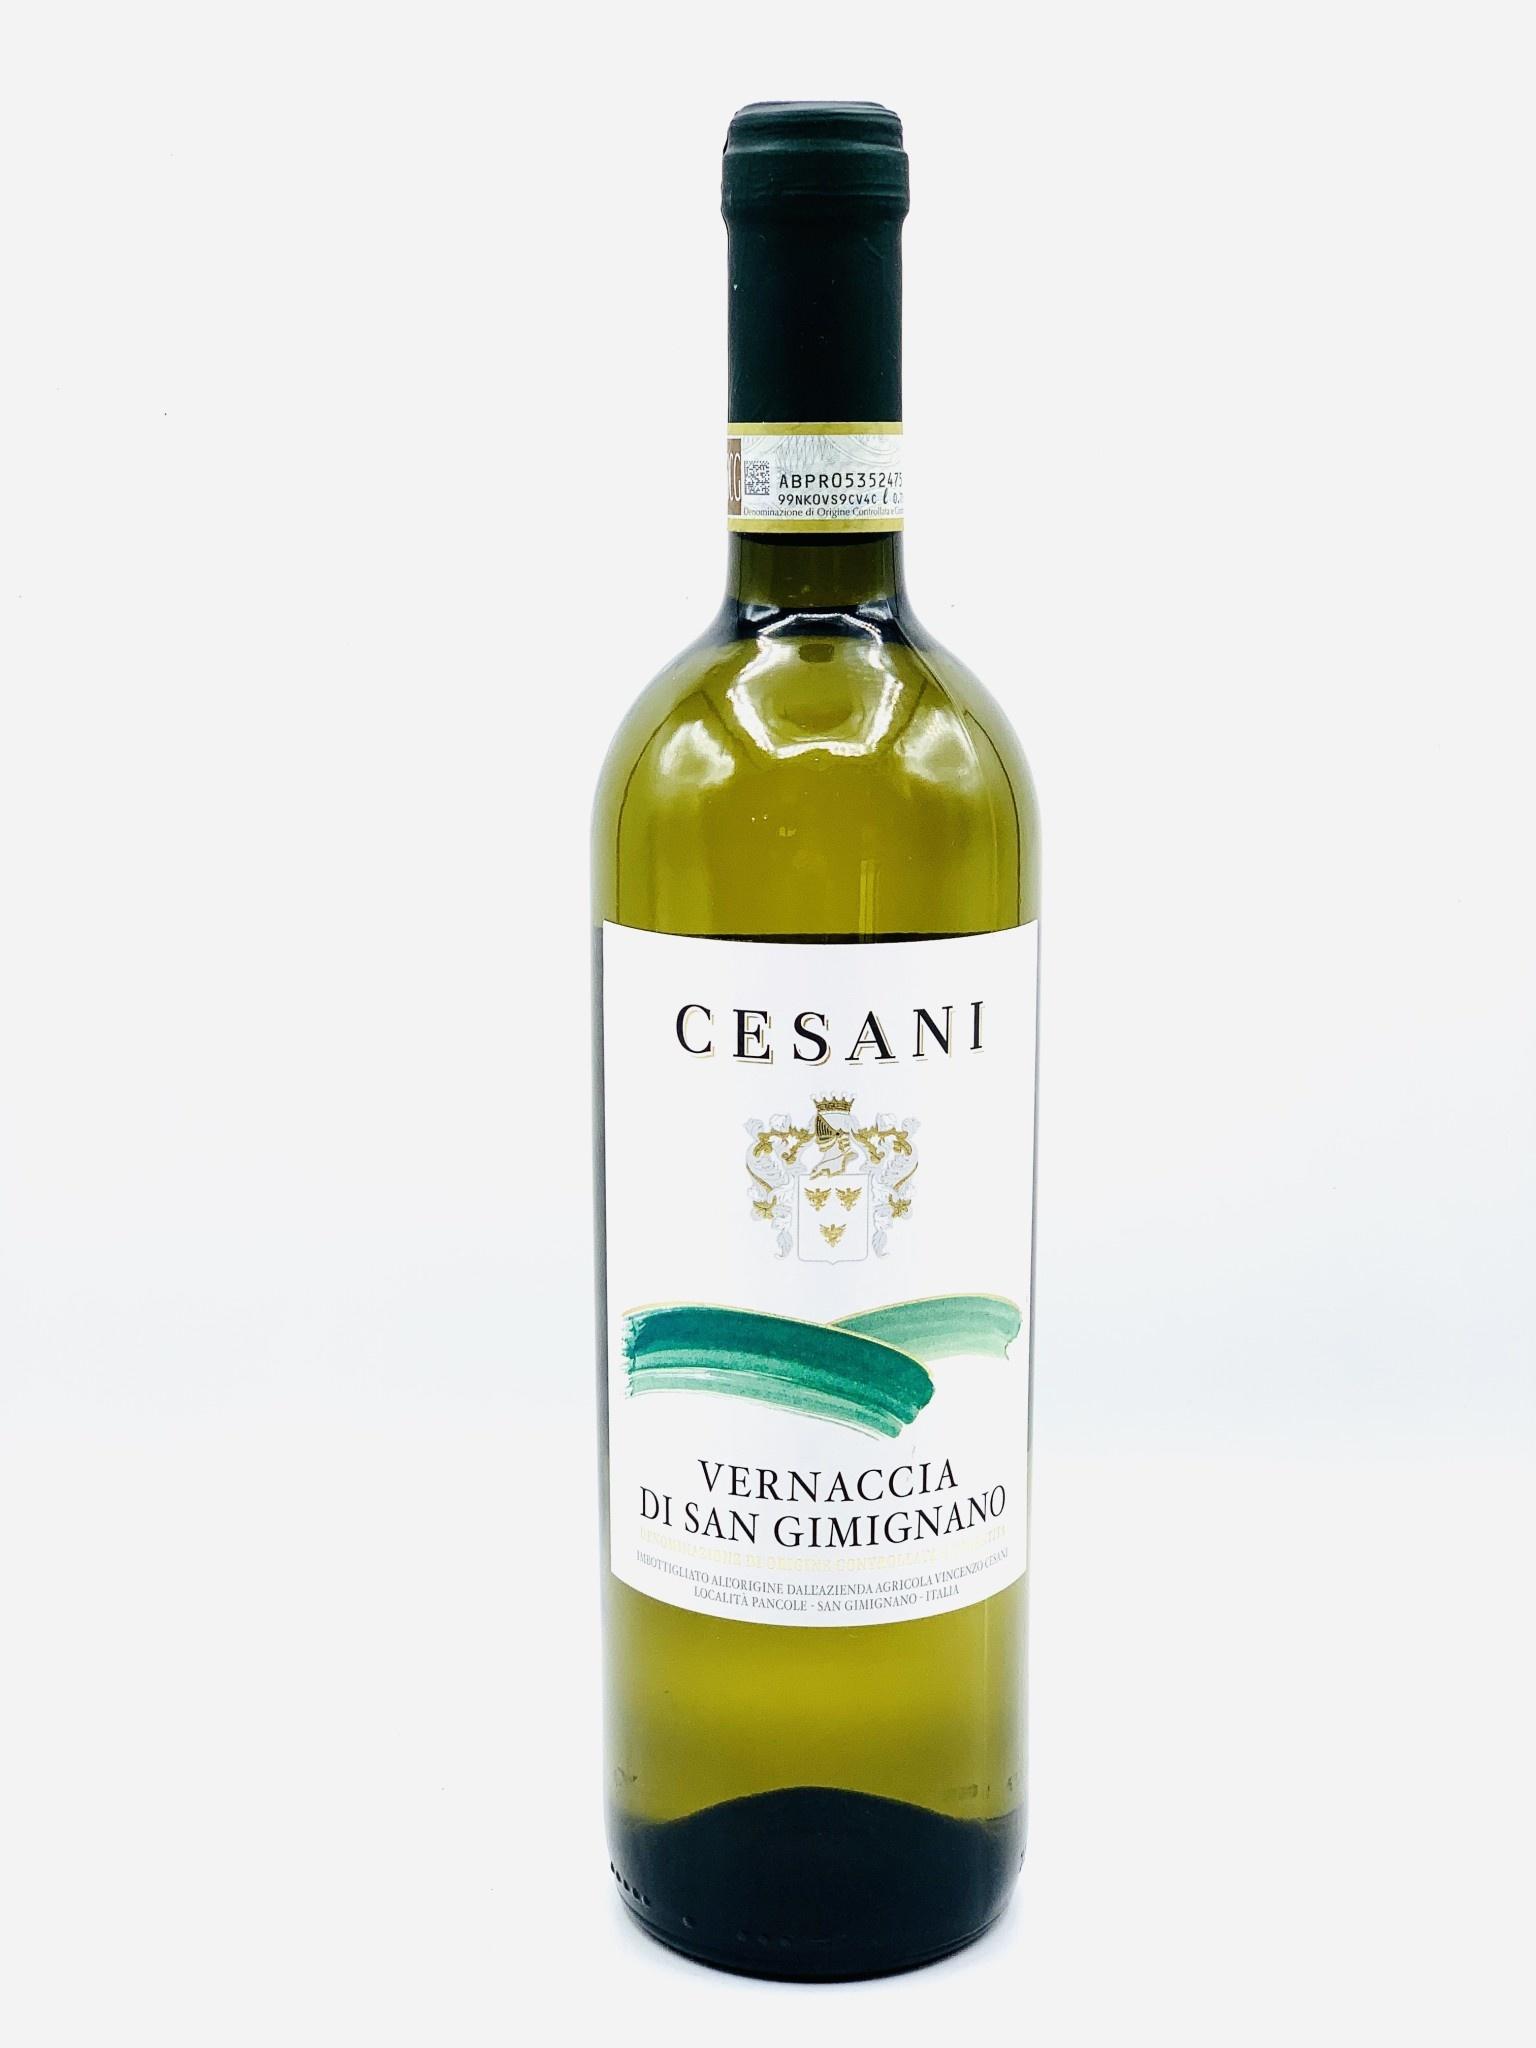 Vernaccia di San Gimignano 2019 Cesani Vencenzo 750ml